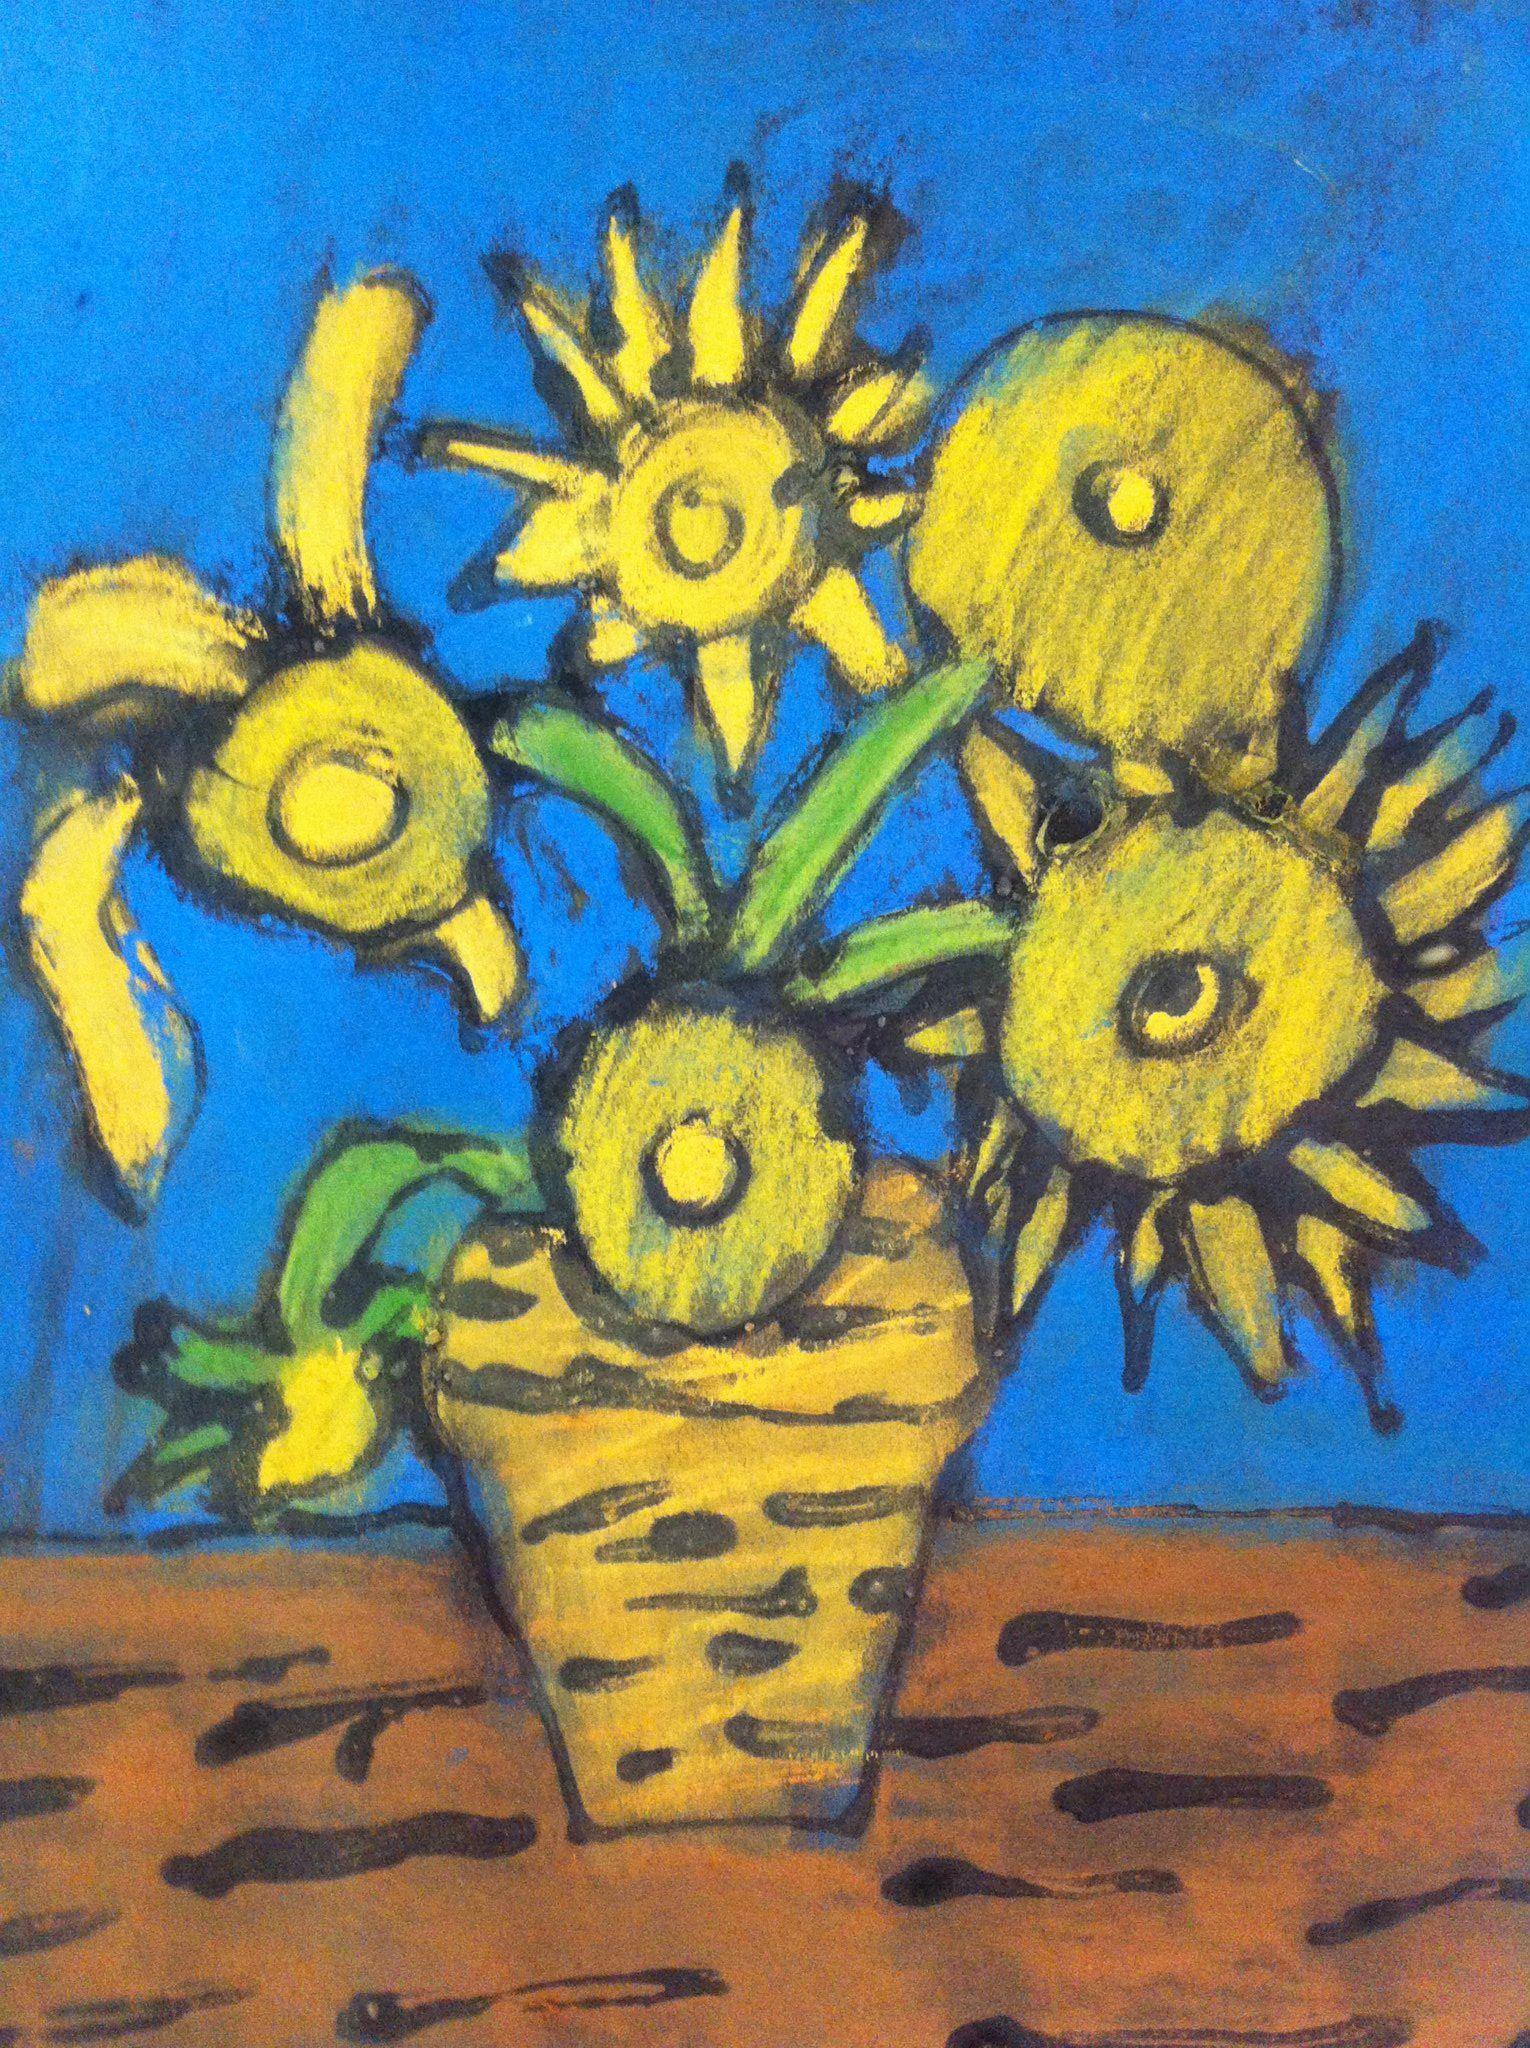 Van Gogh-style Sunflowers